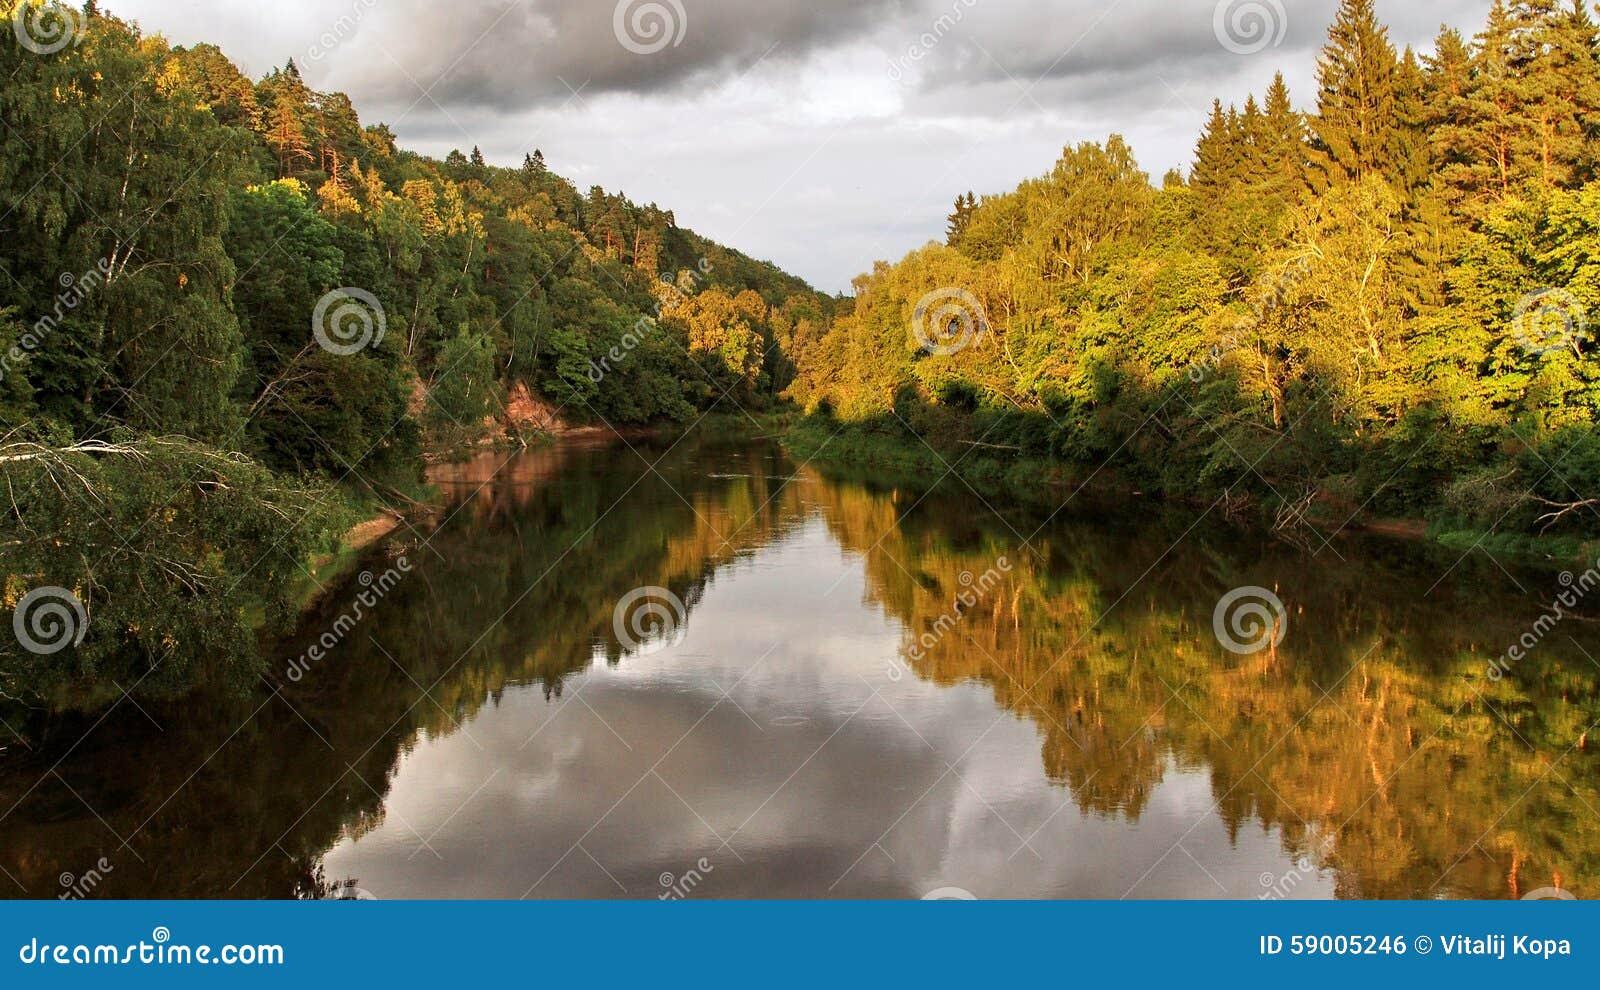 latvian autumn forest river - photo #1